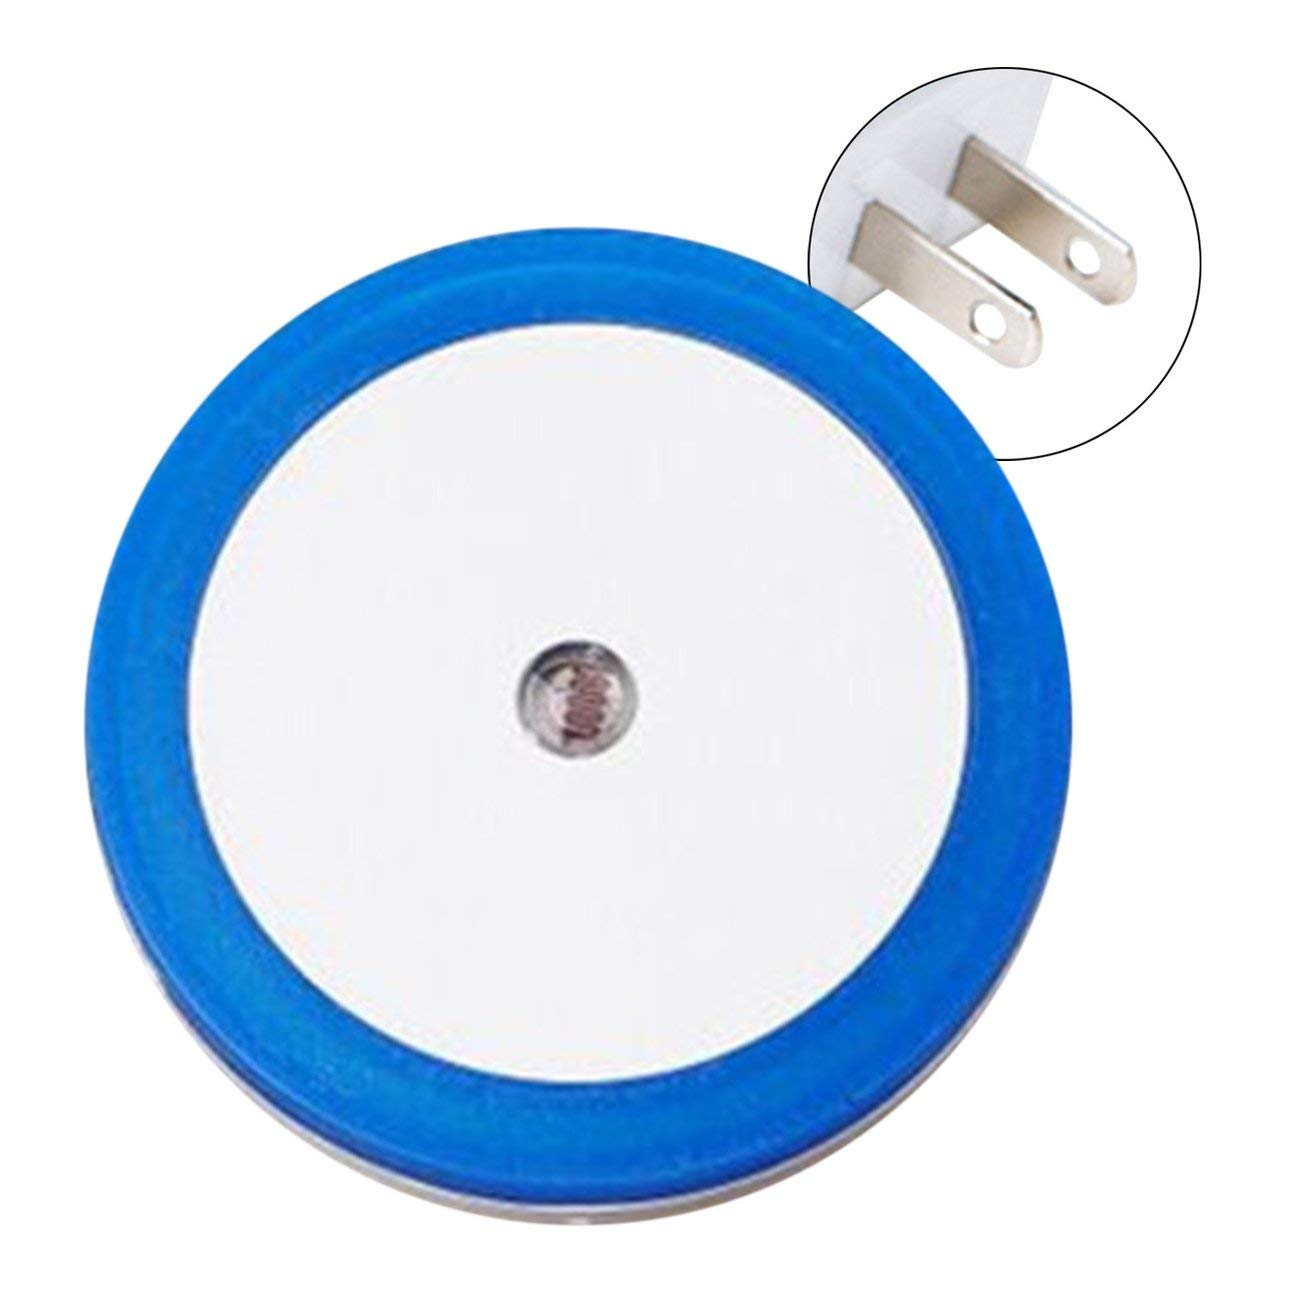 Liobaba Small Round Shape Wall Light LED Induction Lamp Nightlight Automatic Switch Light Sensor Household Supplies Energy Saving